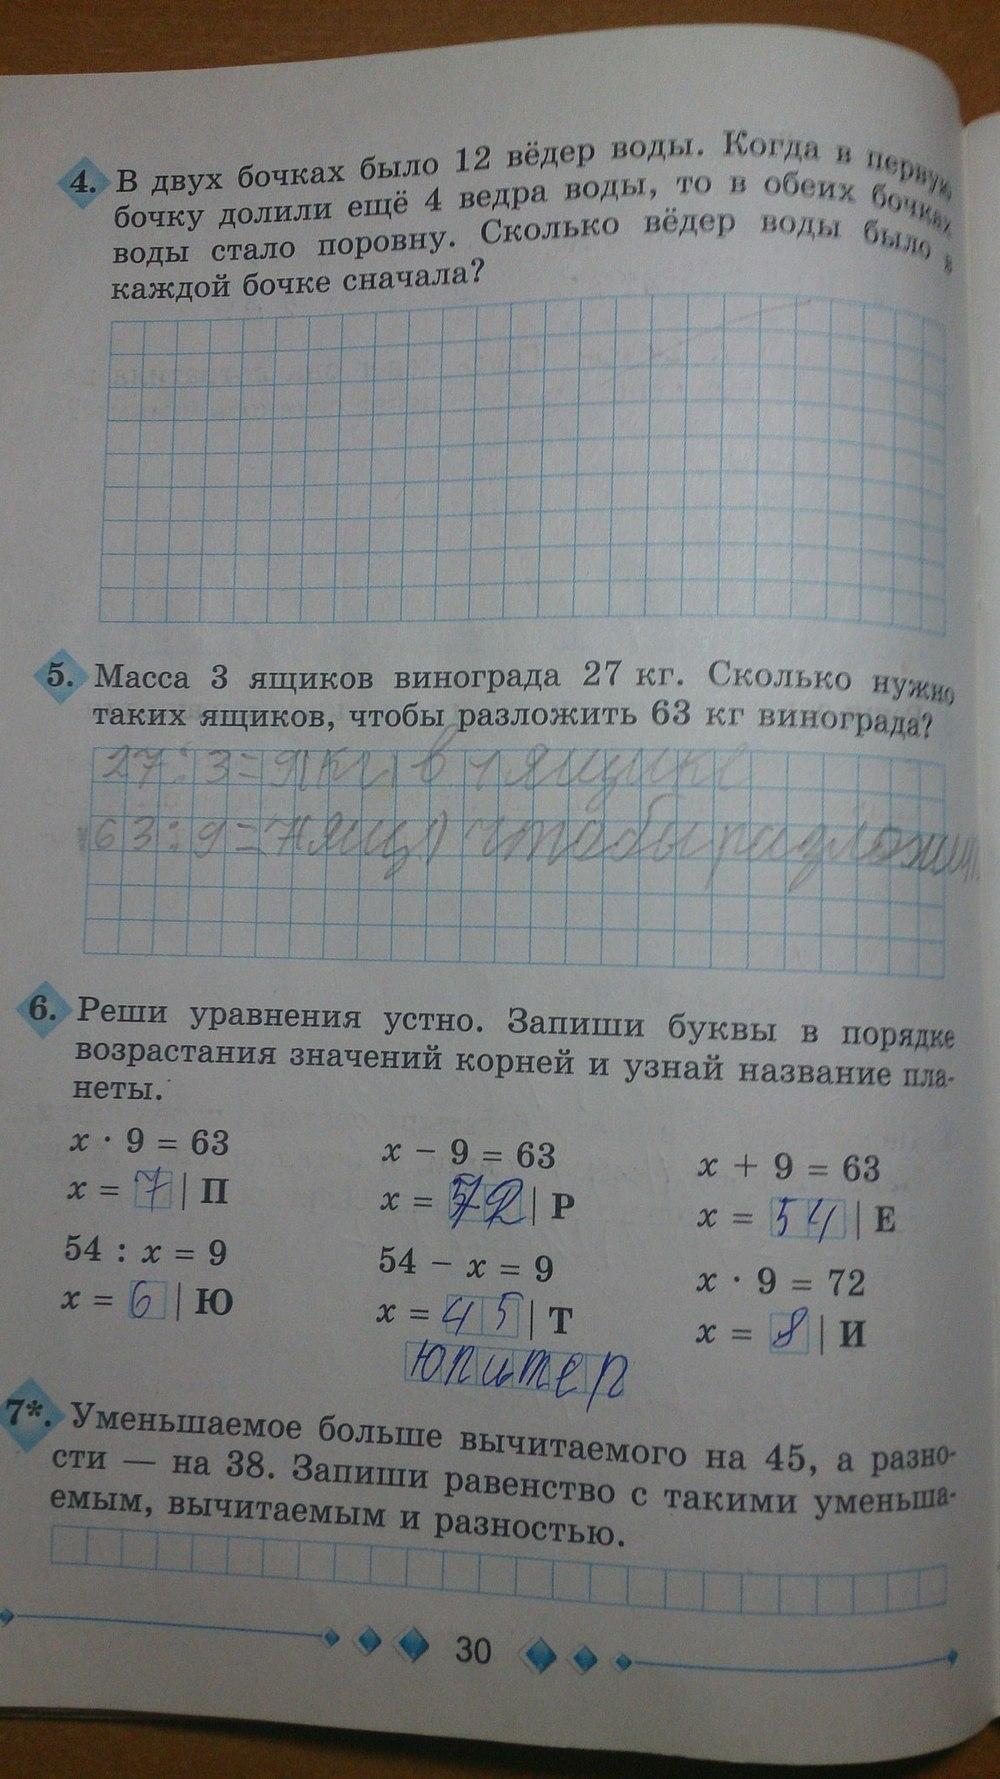 видповидь по гдз математики 2см богданович класс найти 1м 2